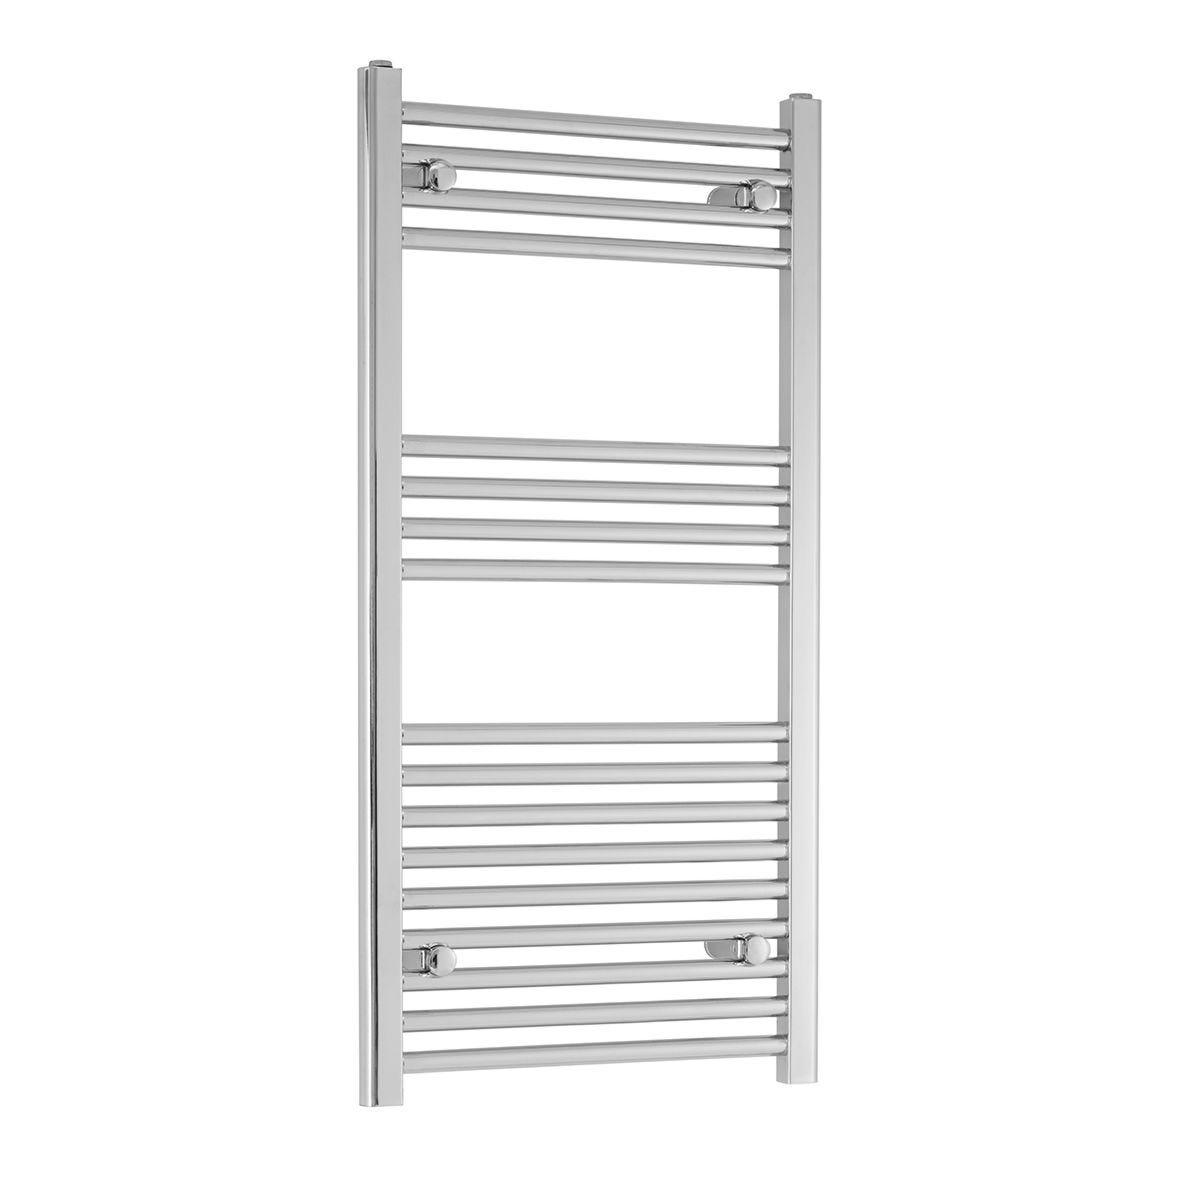 Heating Style Blythe Ladder Rail 1600x600mm Straight - Chrome